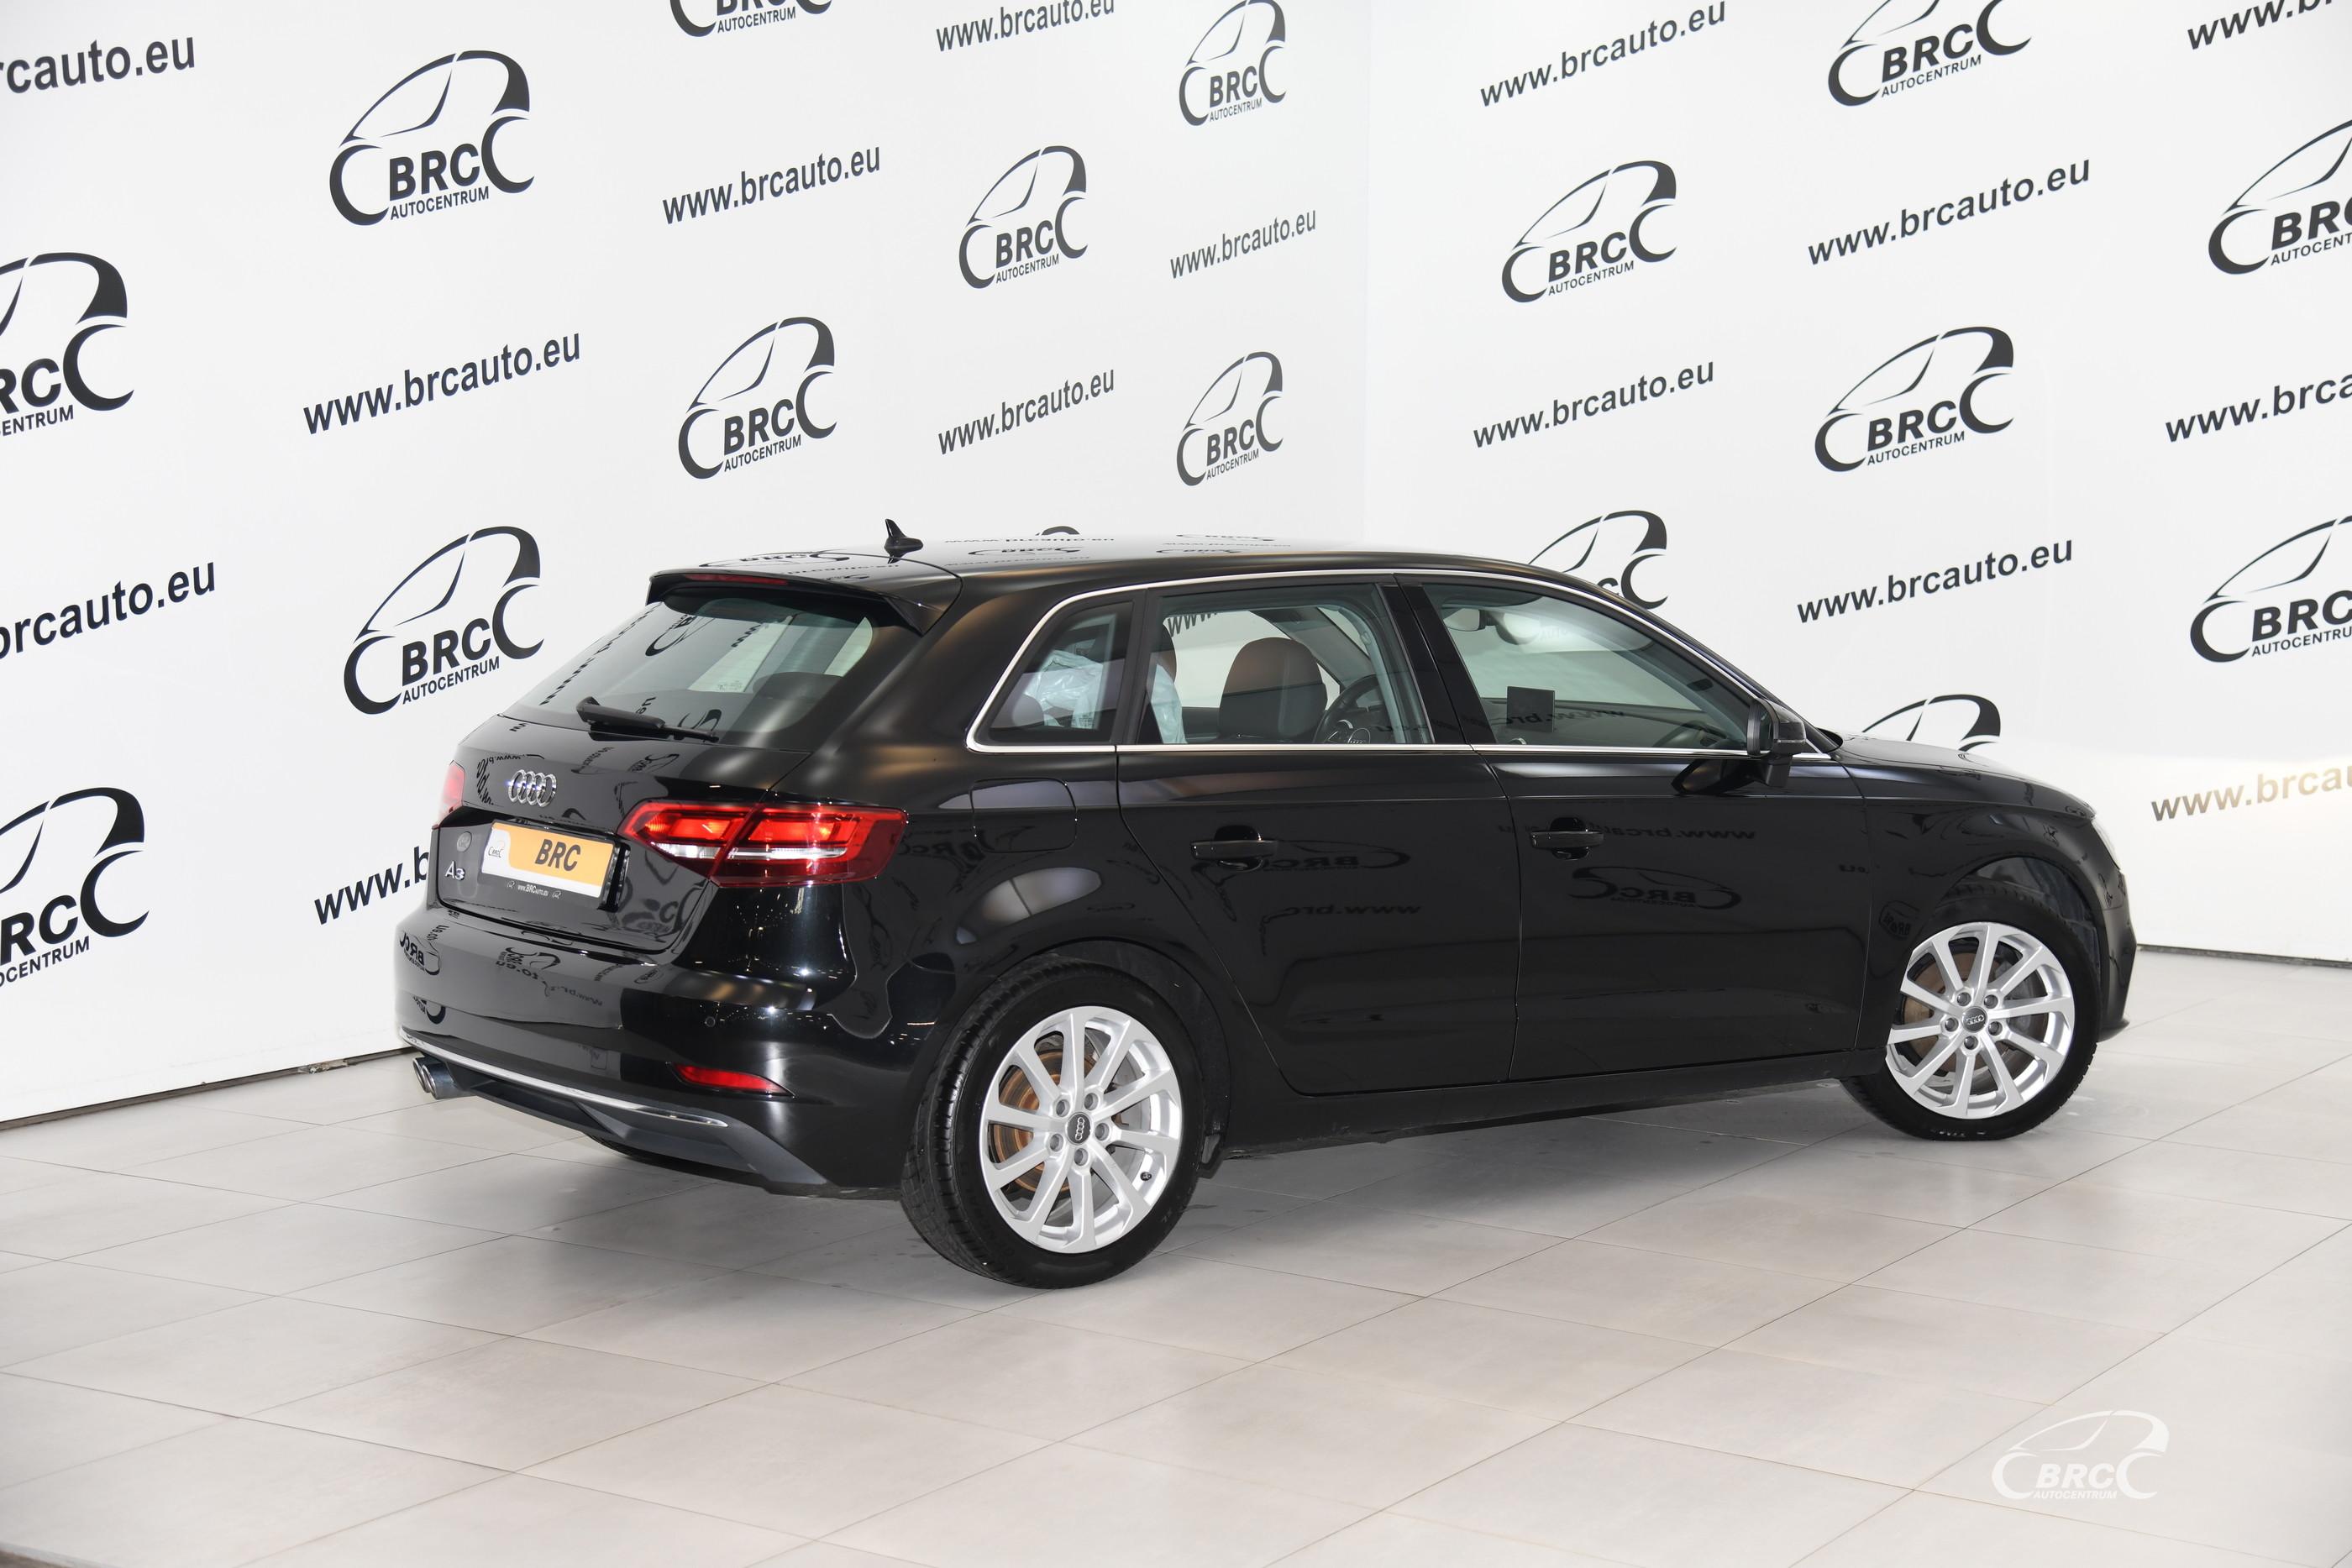 Audi A3 2.0TDI Sportback